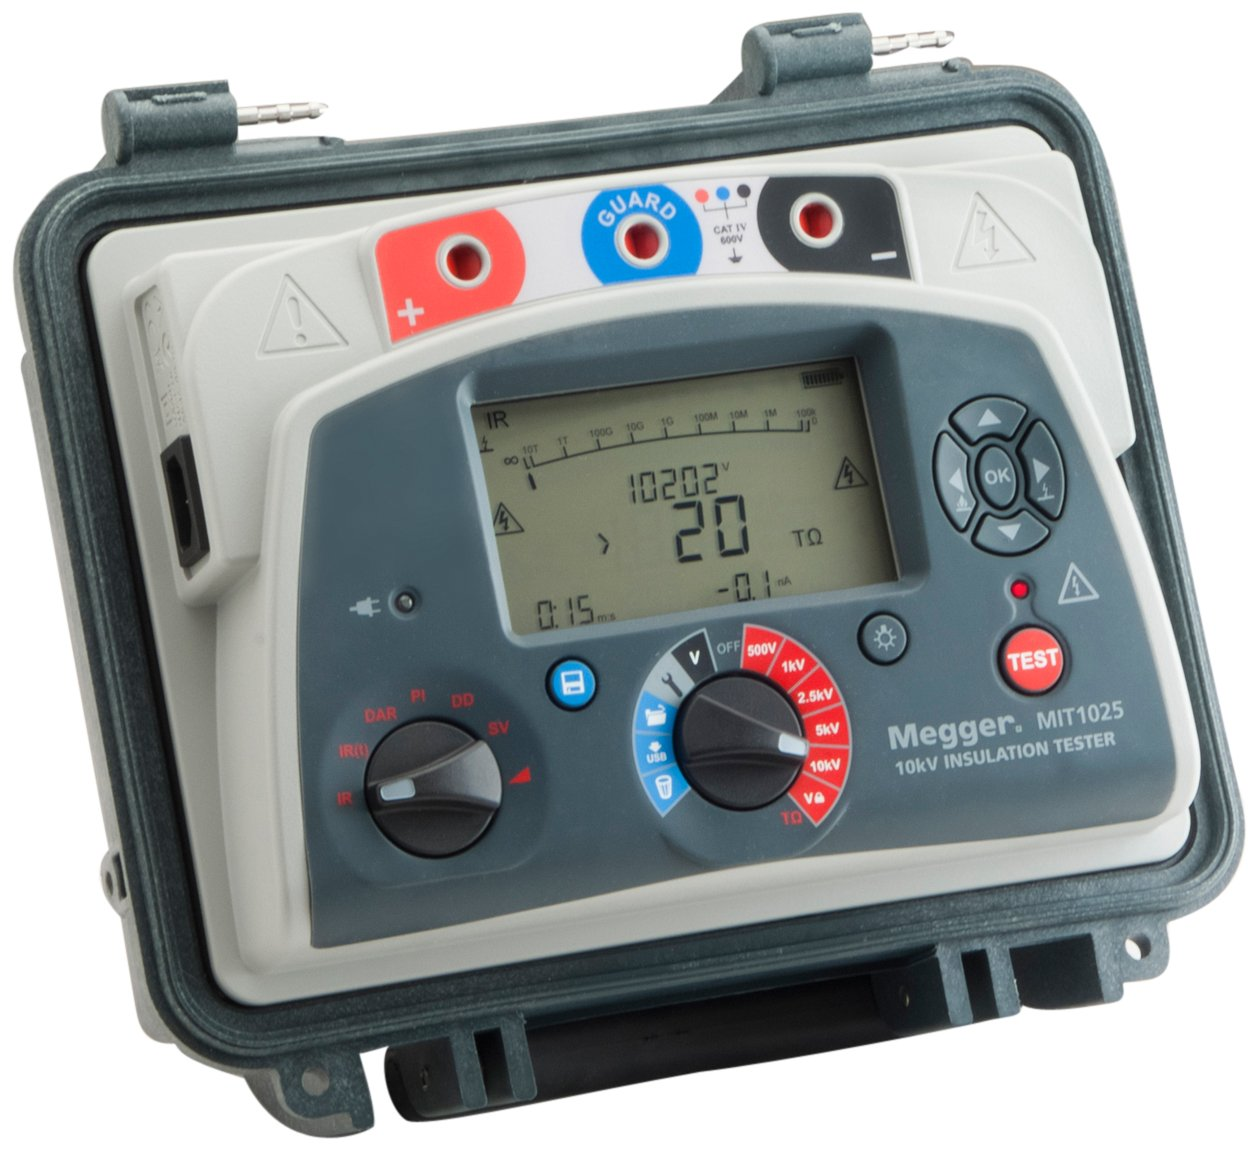 Megger Mit1025 Us Insulation Tester With Output 20 Teraohms Resistance 10kv Multi Range Test Voltage Insulation Resistance Meters Amazon Com Industrial Scientific